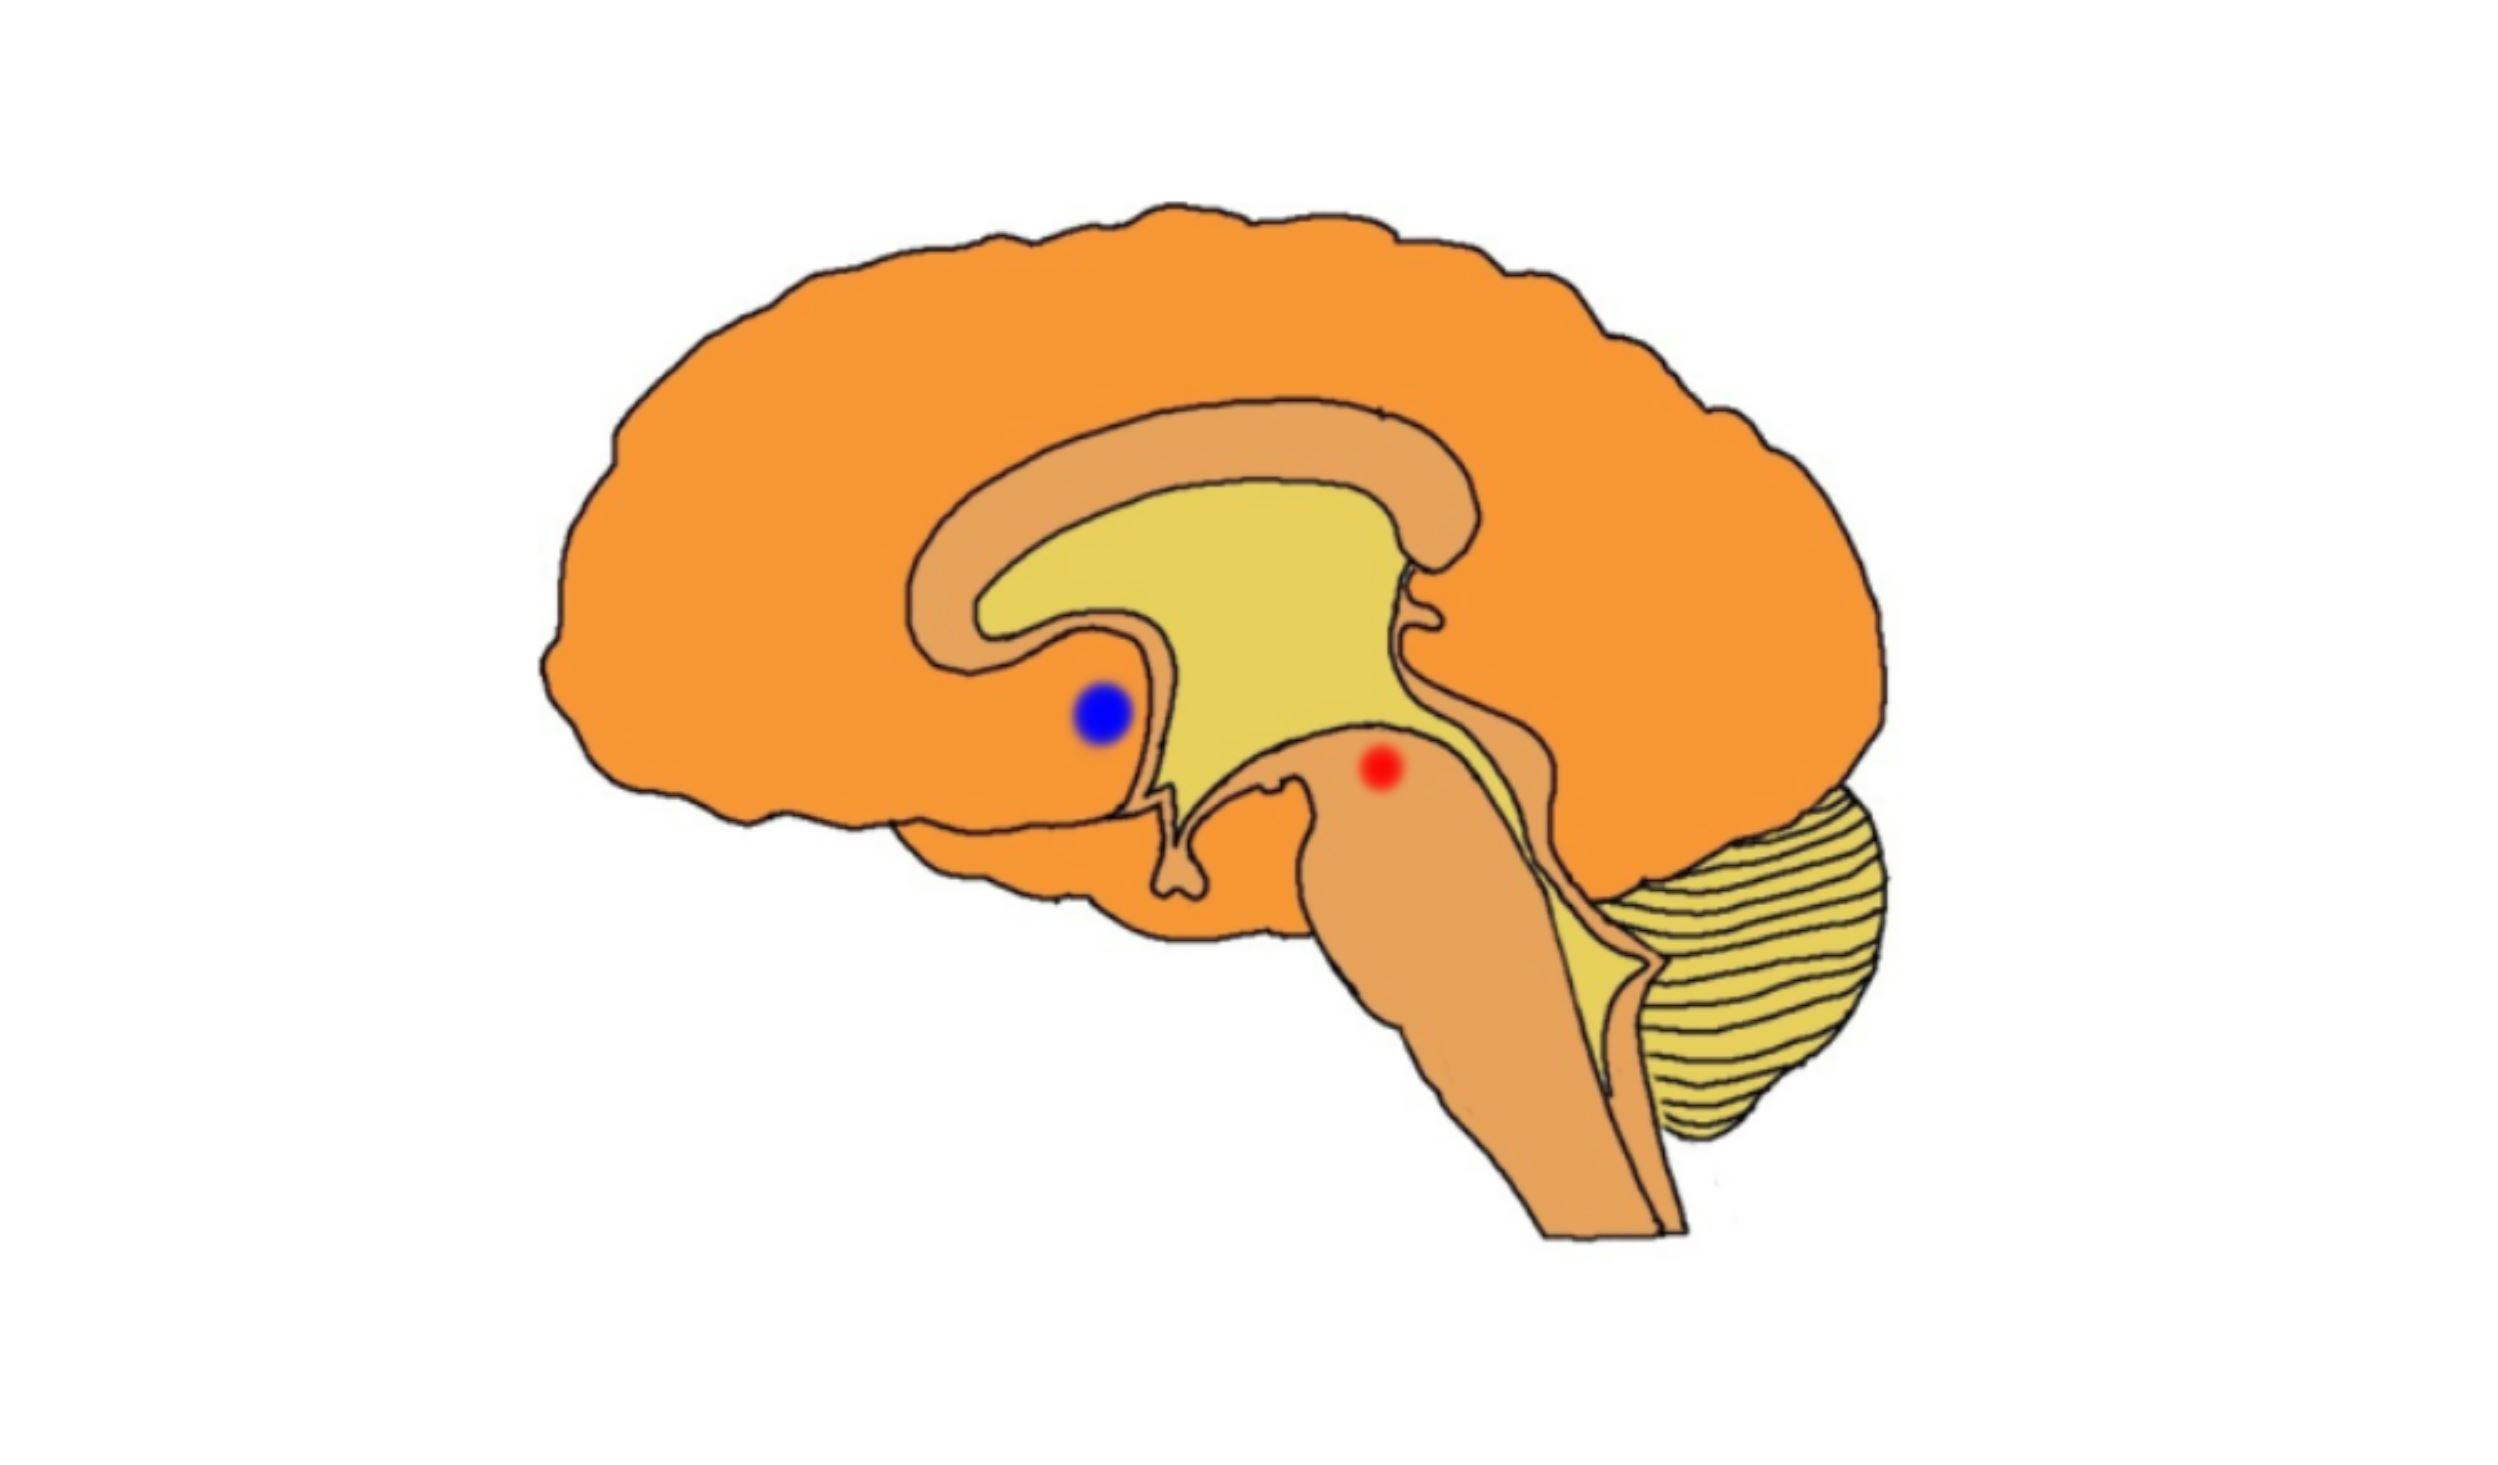 "2-Minute Neuroscience<a href=""/blog/2-minute-neuroscience-reward-system"">→</a><strong>Reward System</strong>"